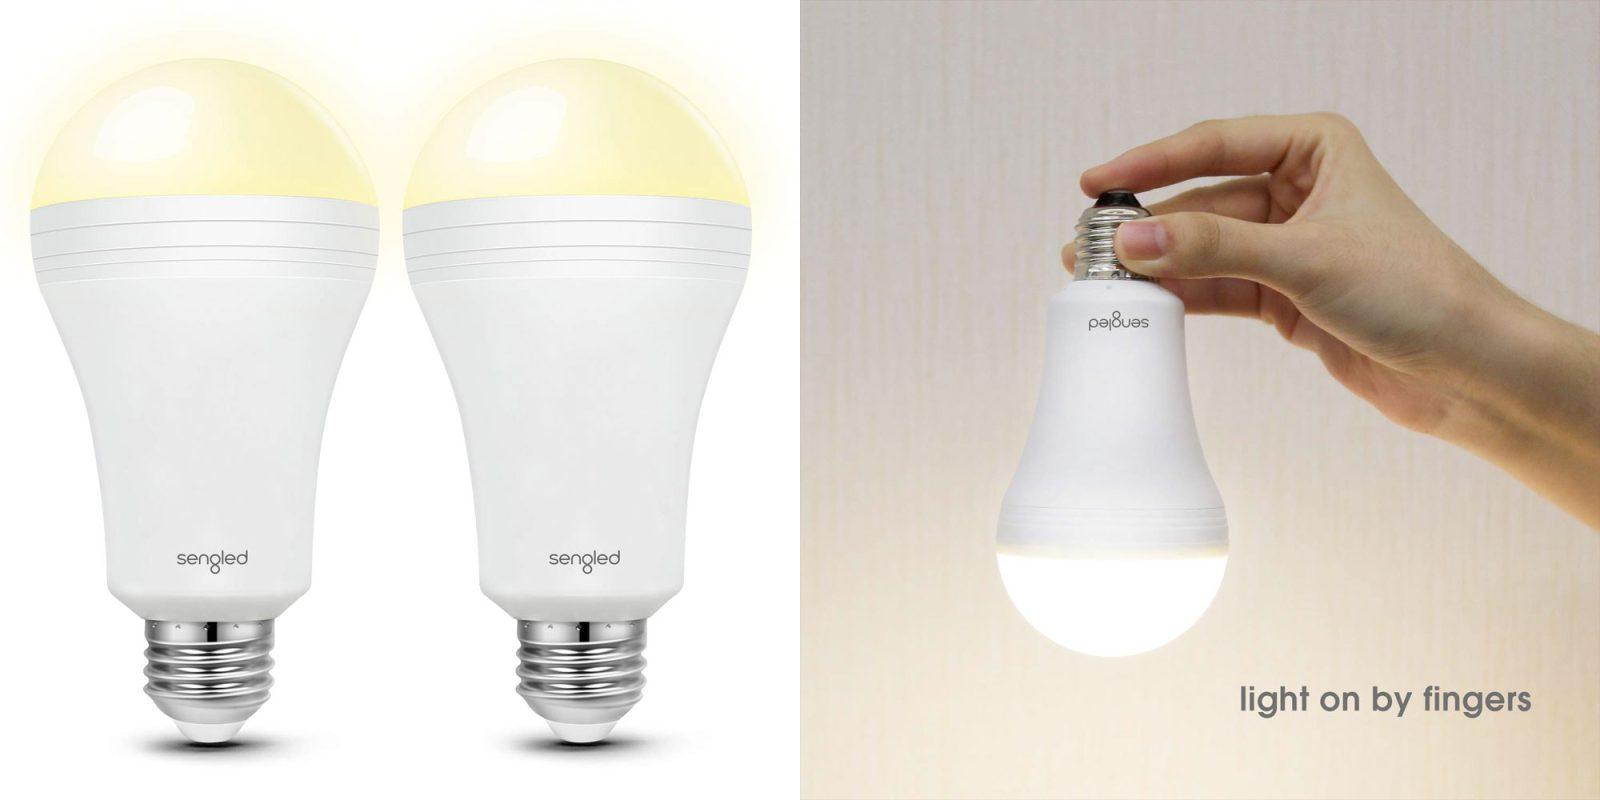 Green Deals 2 Pack Led Emergency Light Bulbs W Built In